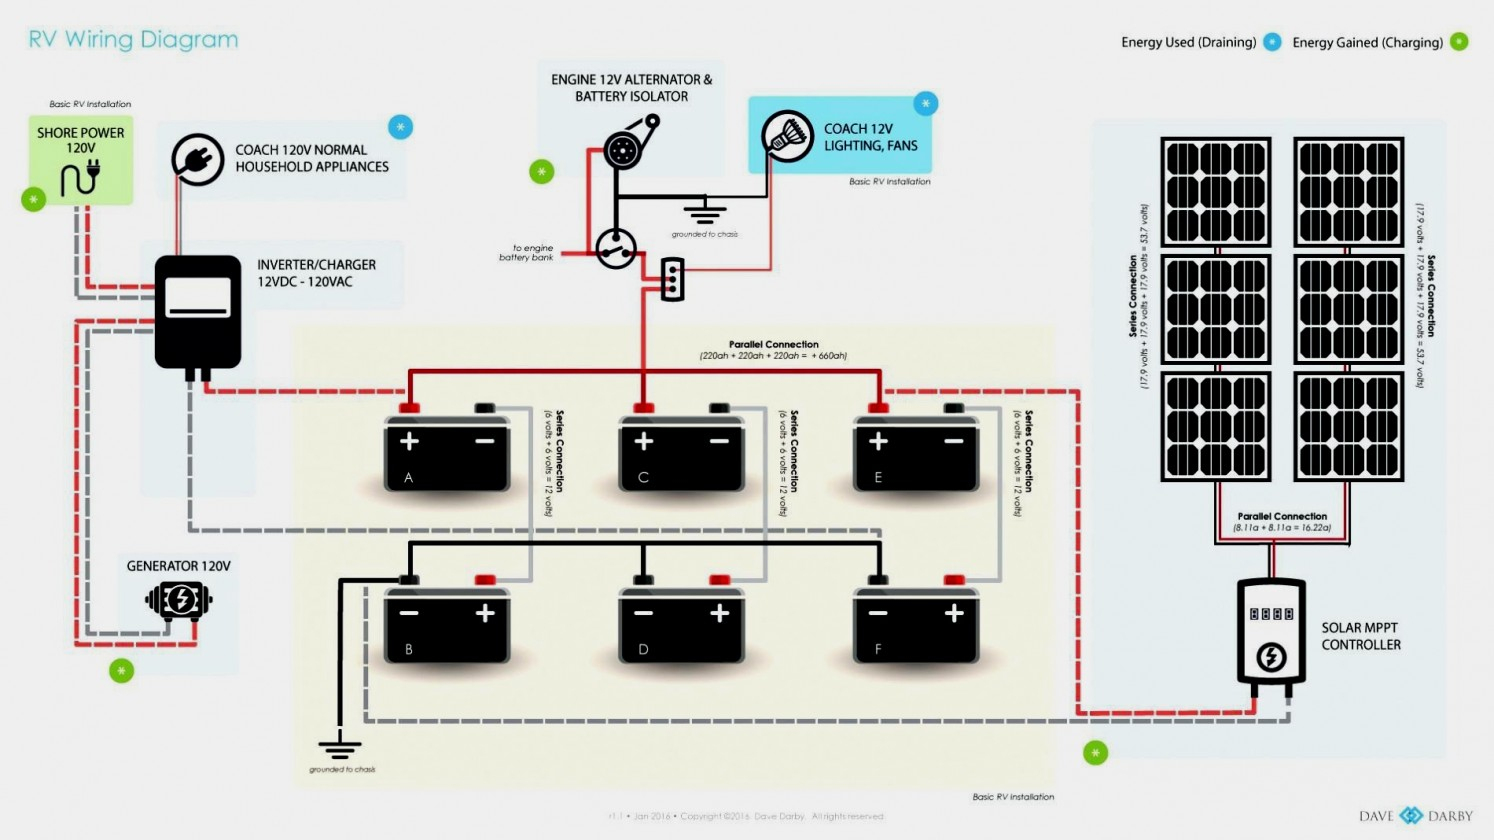 Rv 12V Electrical Wiring Diagram Lights | Wiring Diagram - 12V Wiring Diagram